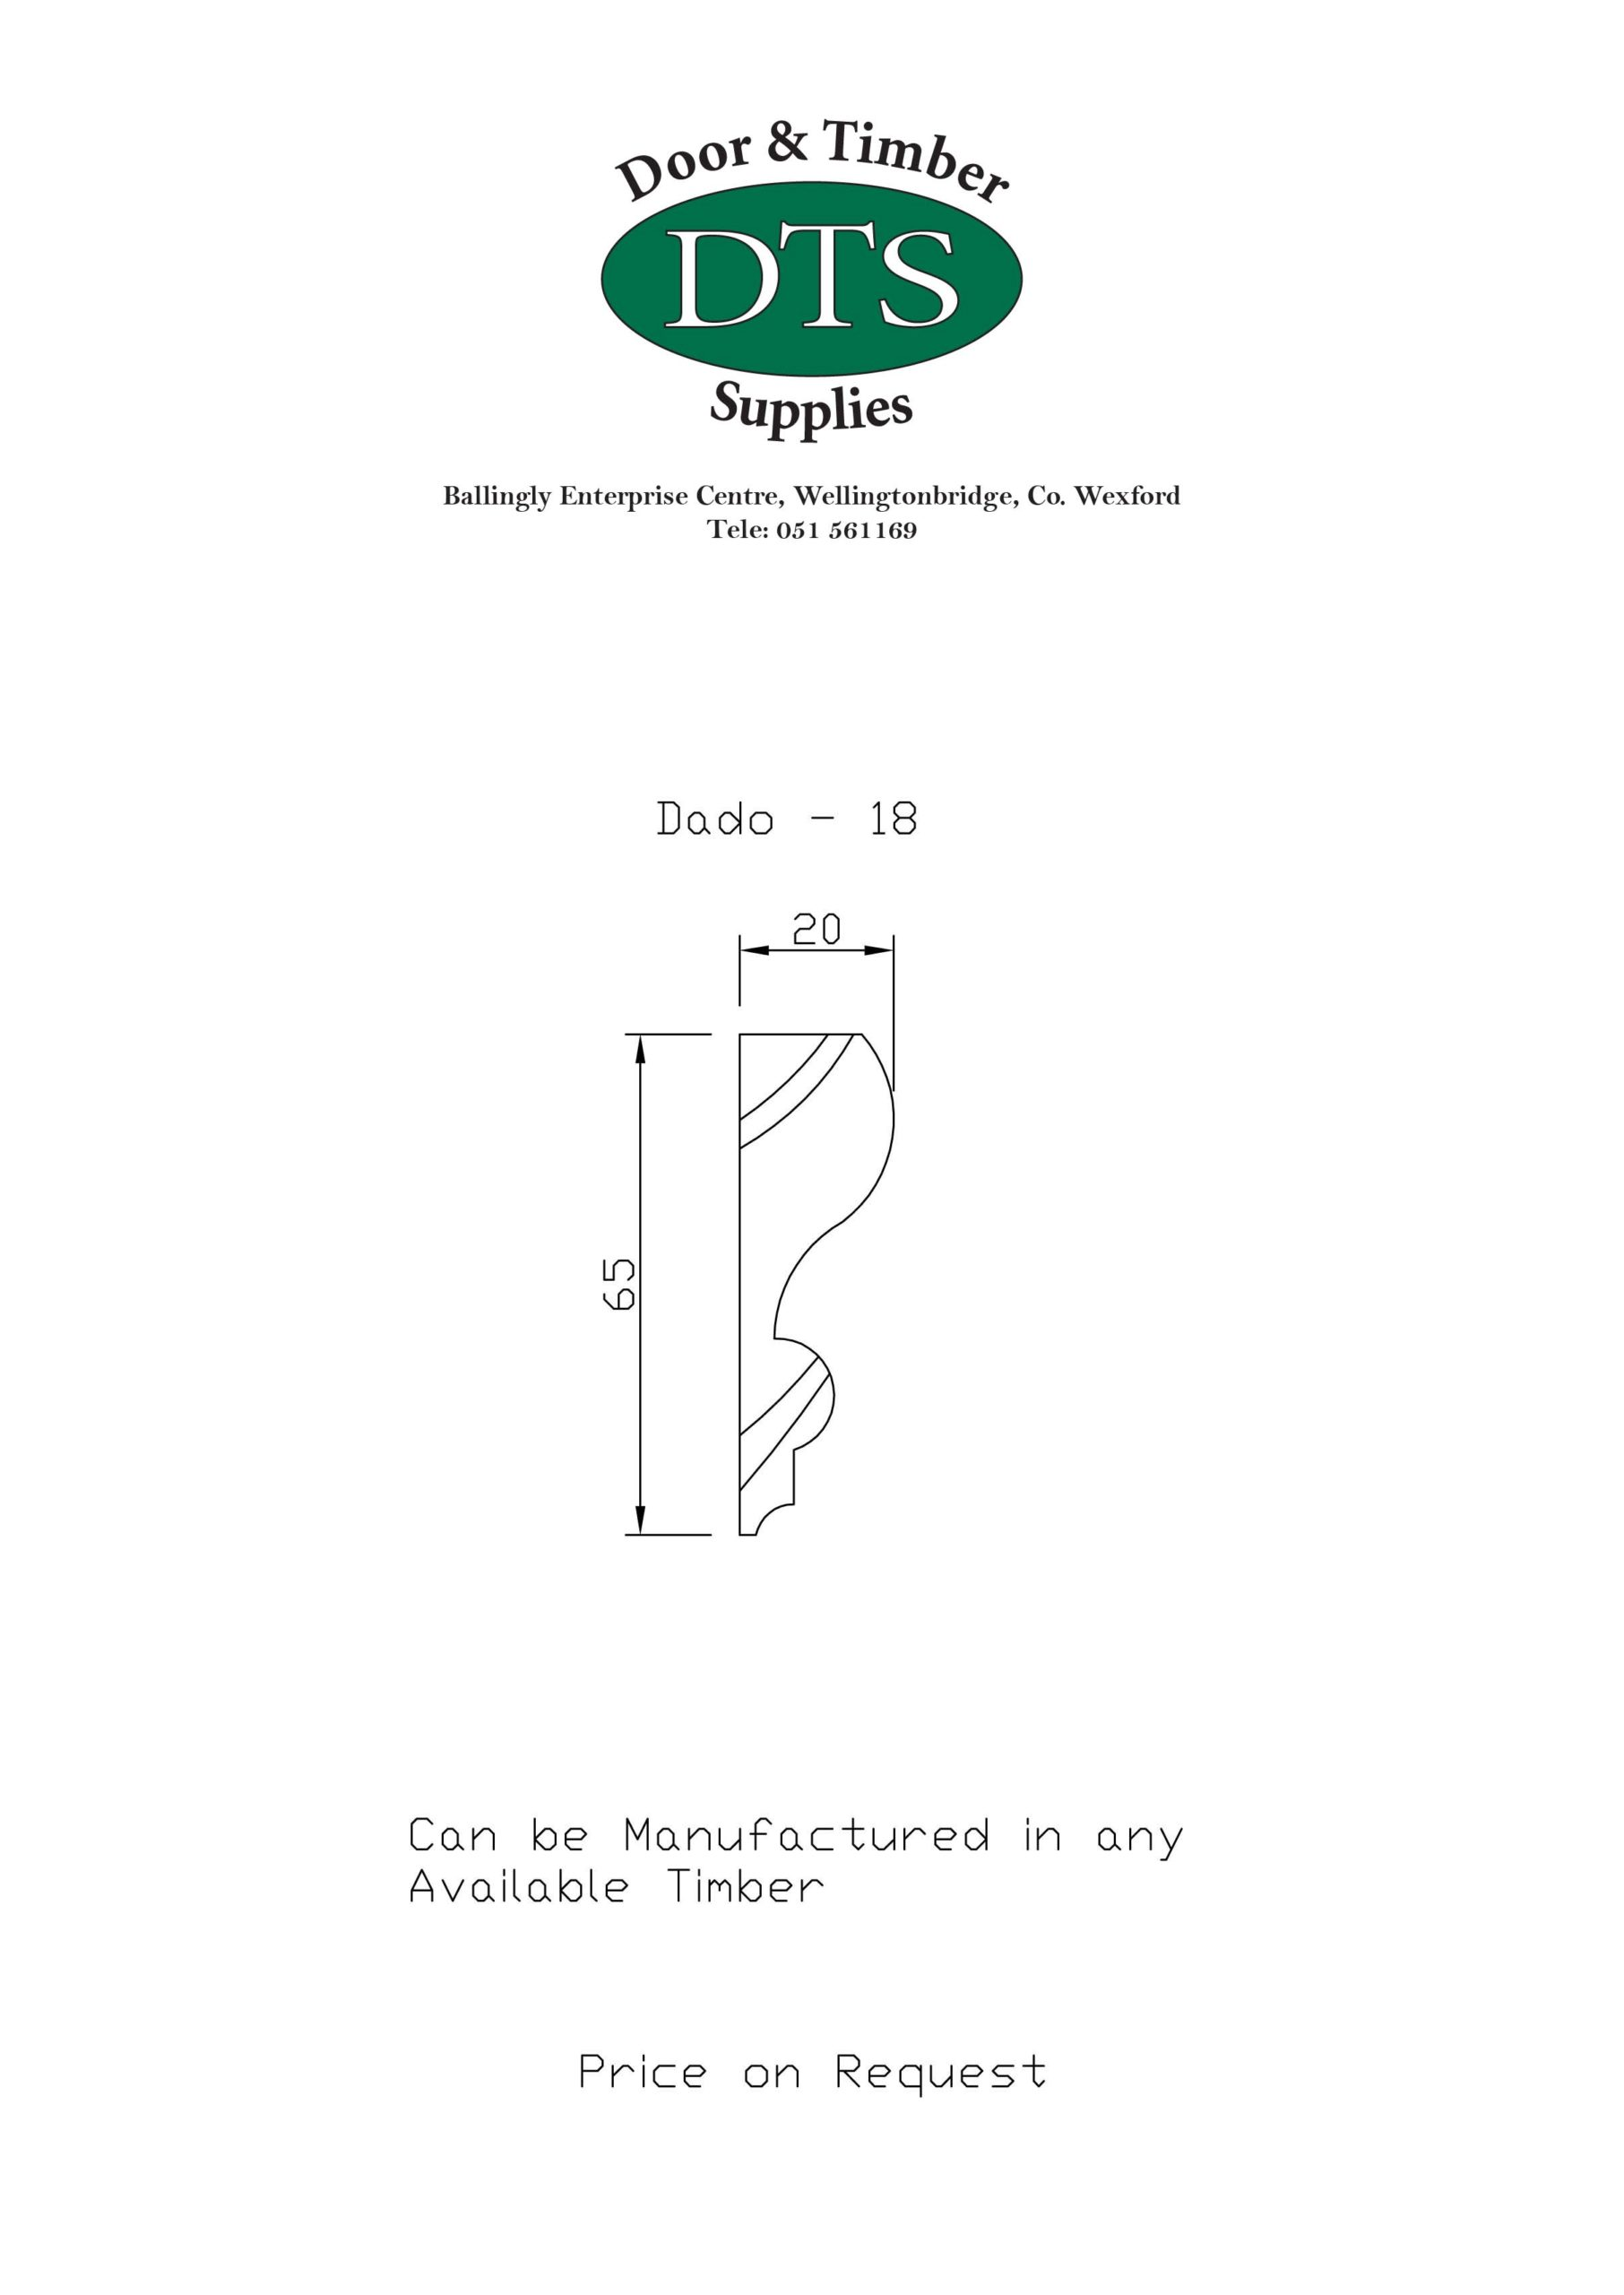 Door and Timber Supplies - Bespoke Dado Rails